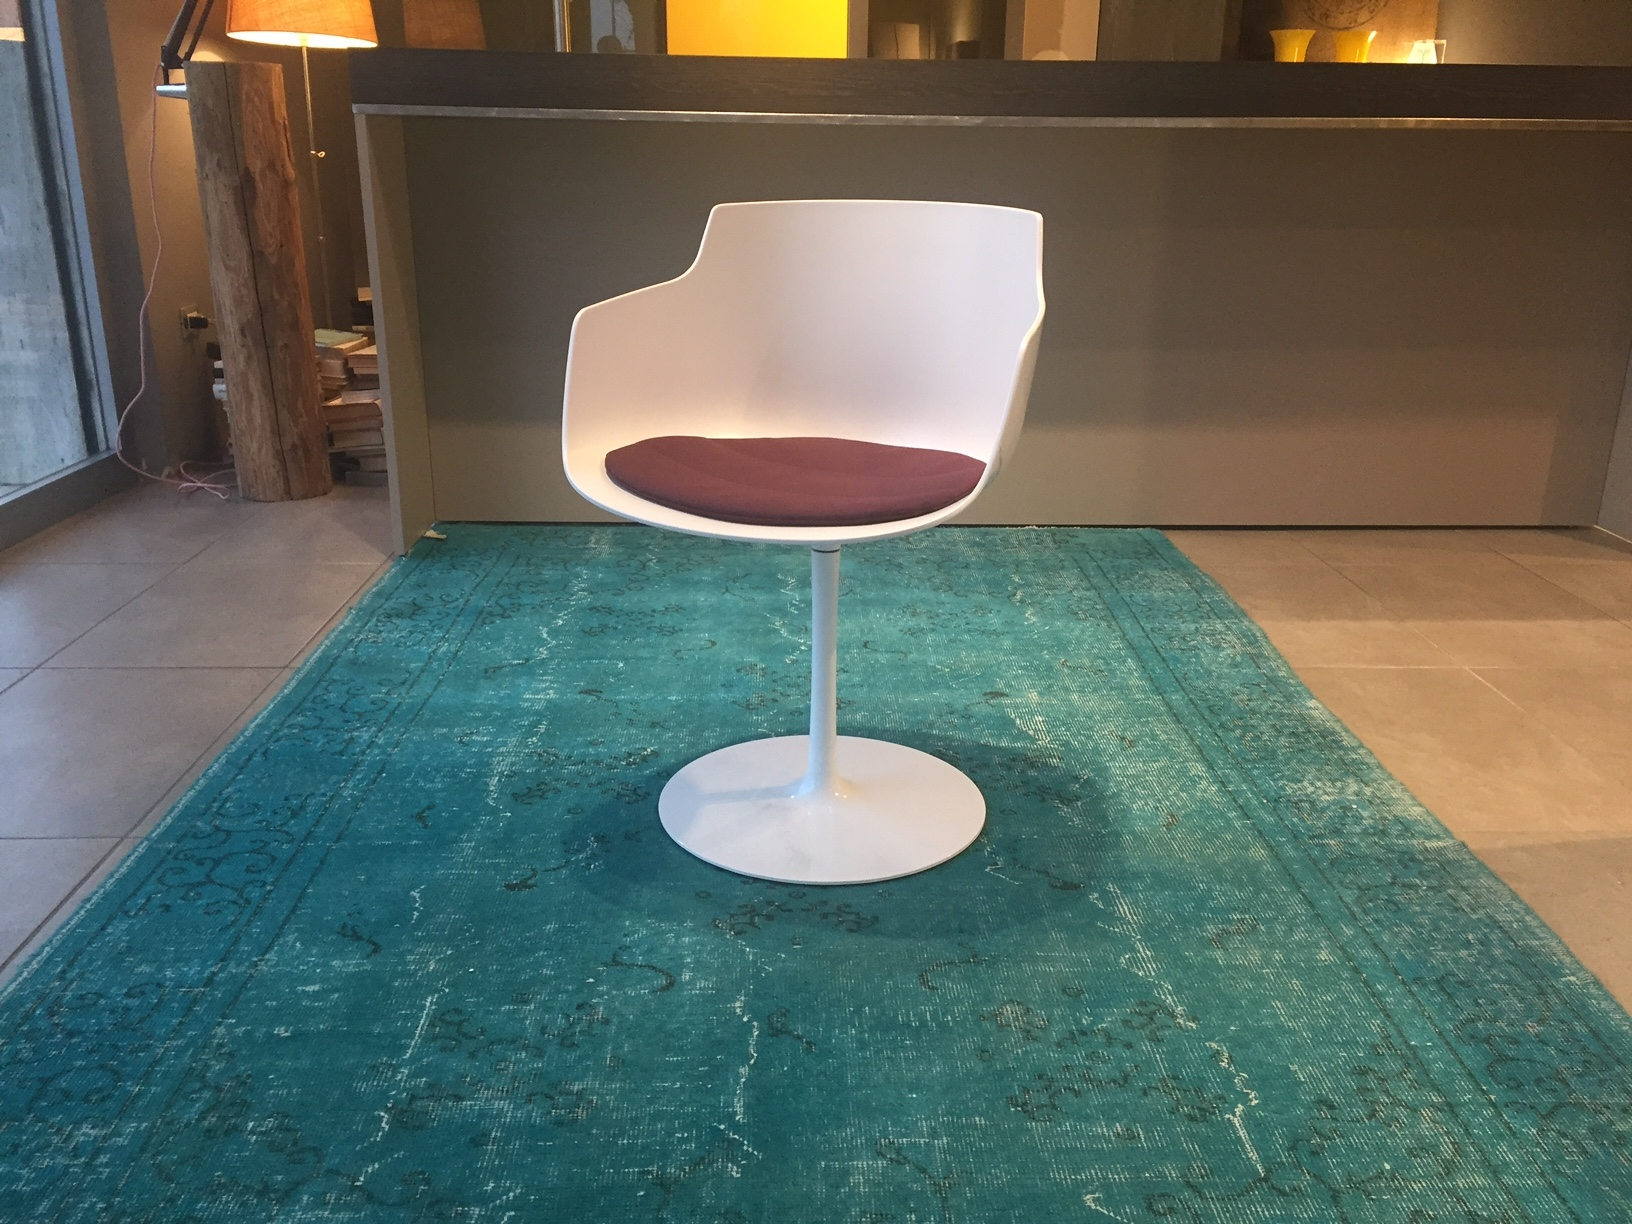 Sedie design mdf italia sedie a prezzi scontati for Sedie design scontate